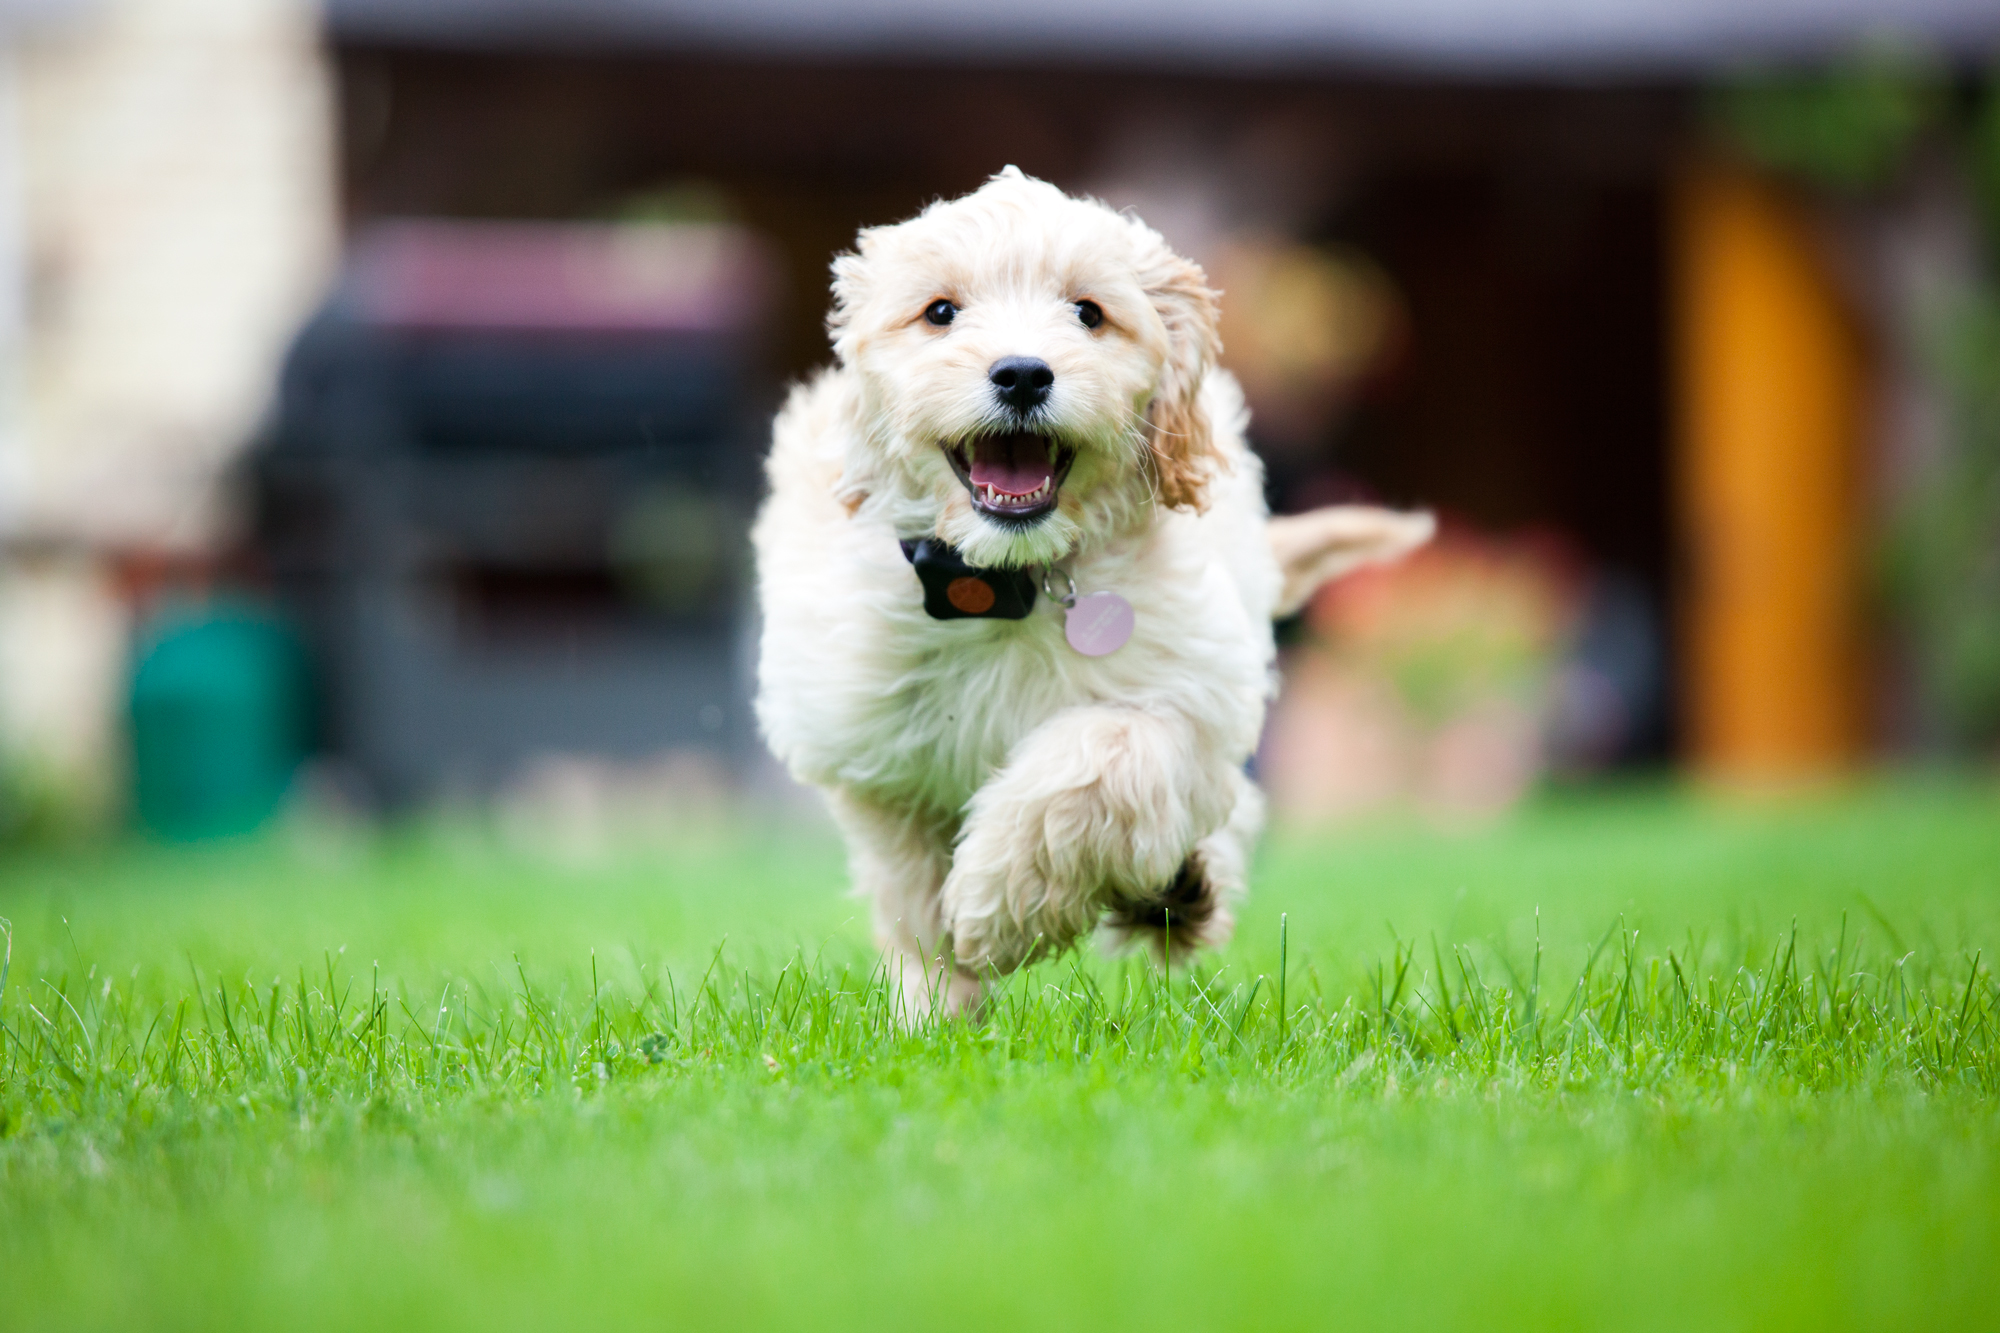 PitPat - The Dog Activity Monitor